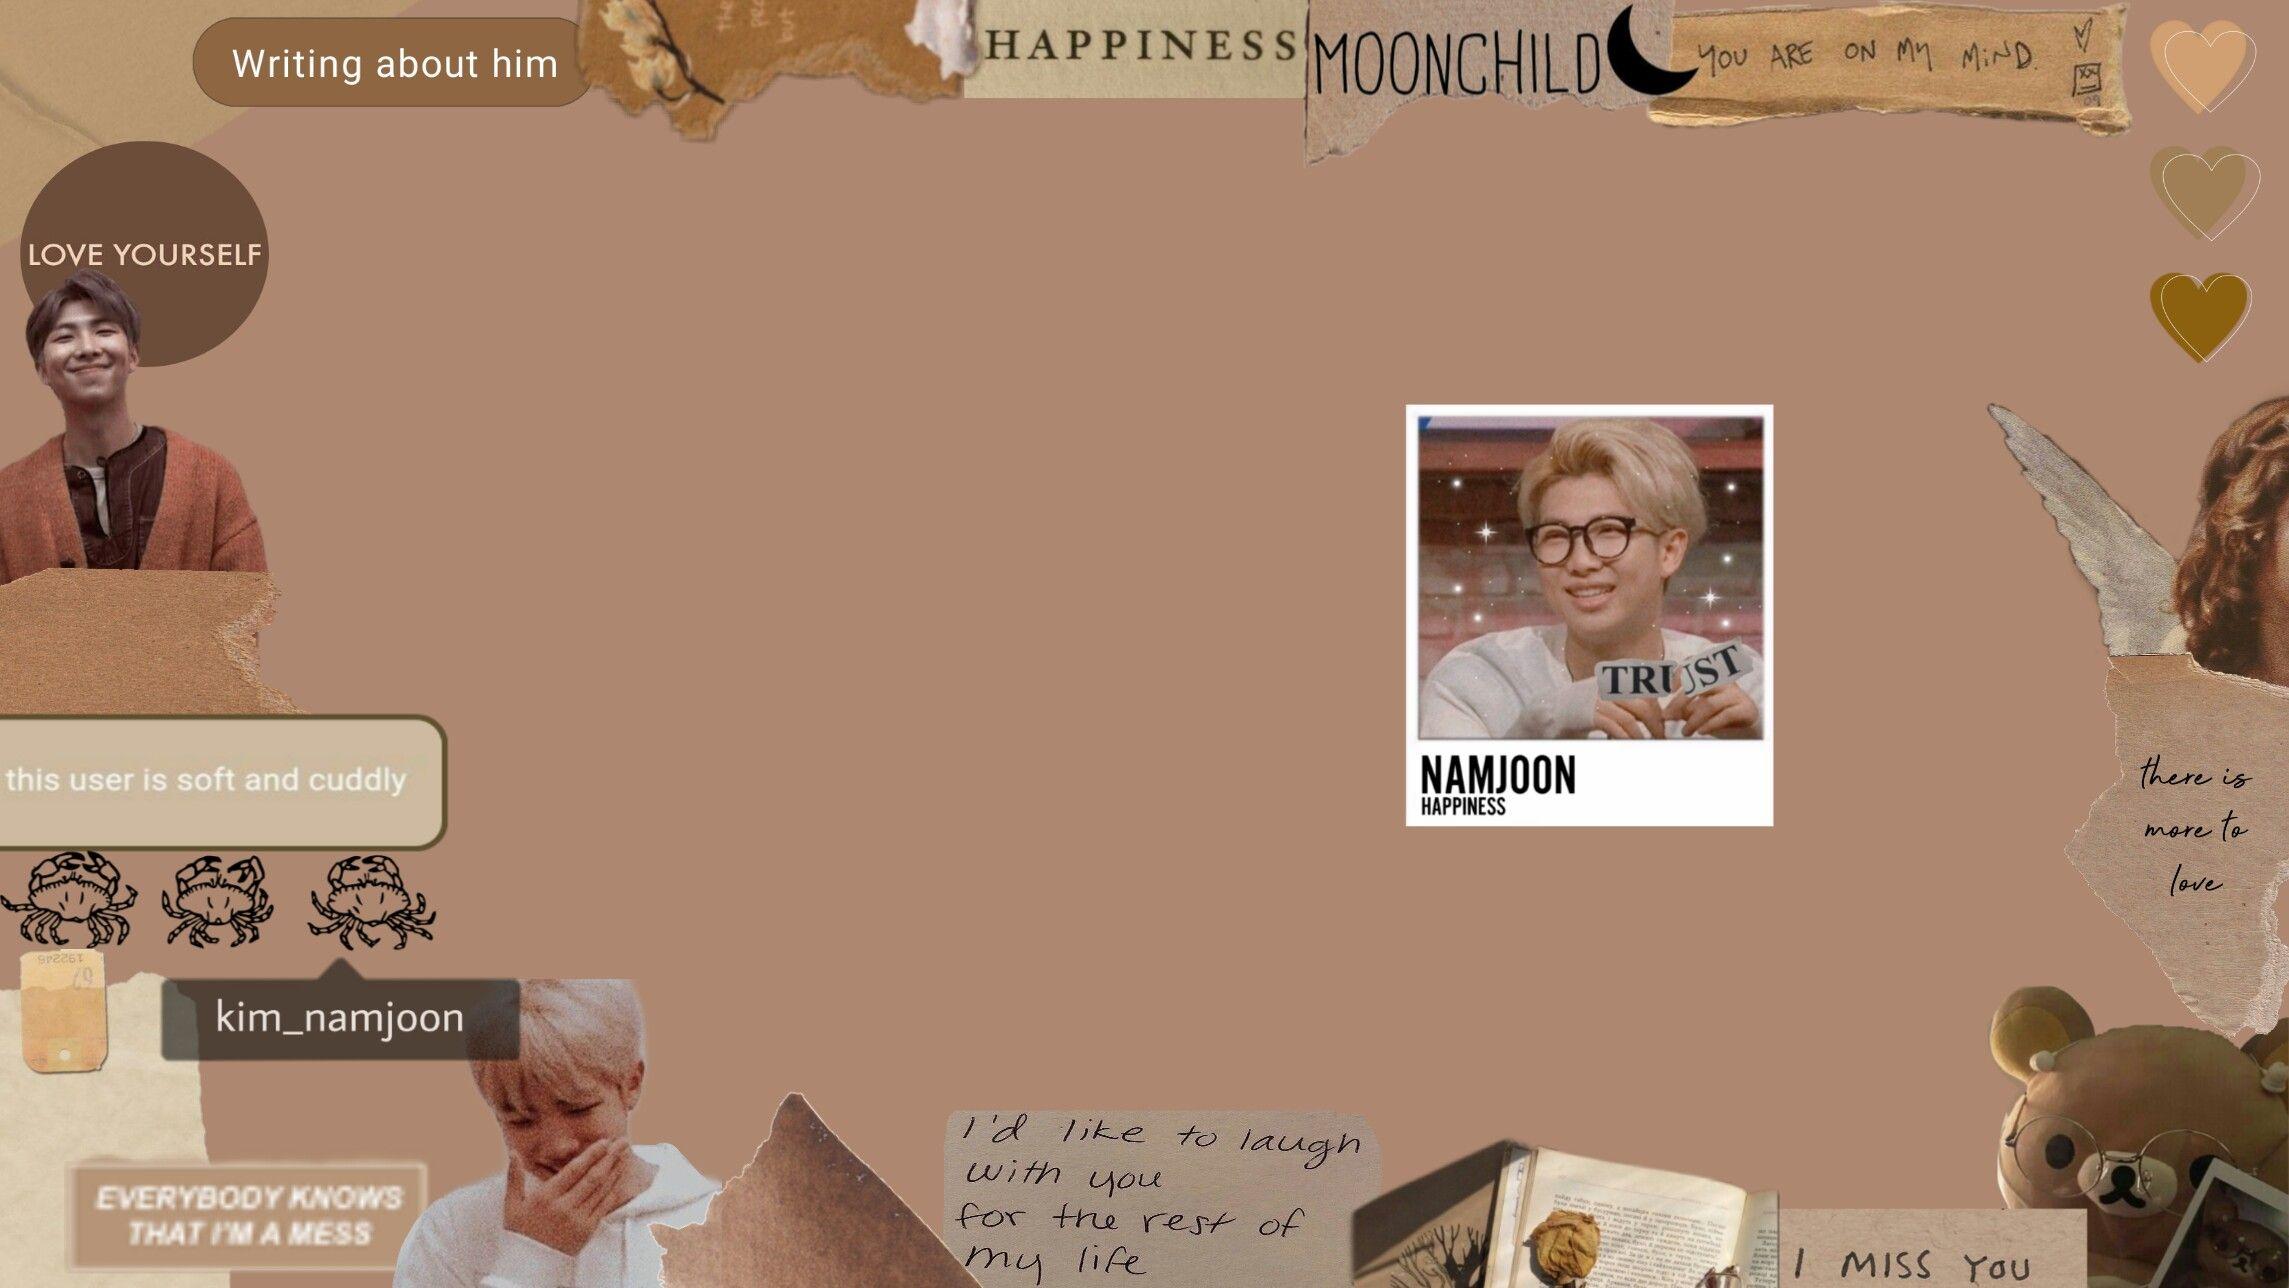 namjooncover photoaesthetic brown tonelaptop